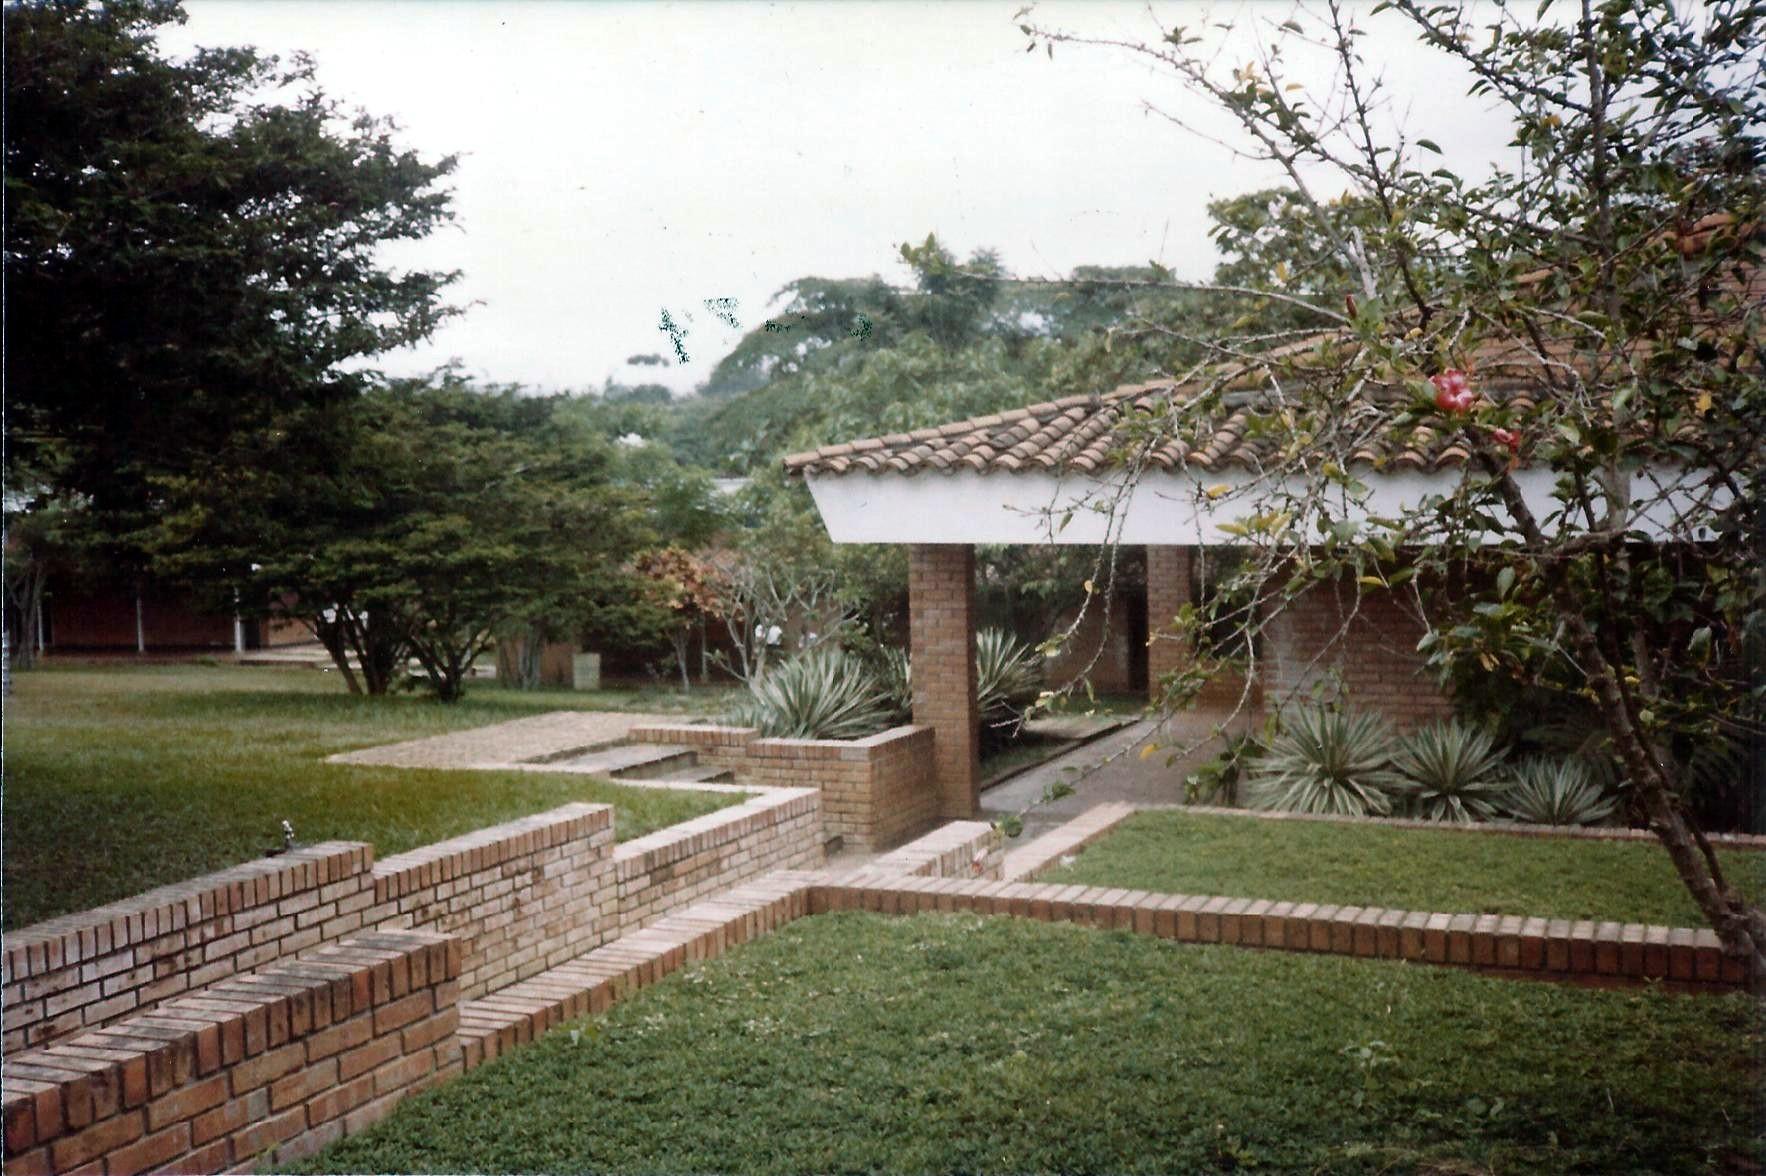 Nuestra Historia | Cali | Colegio Be